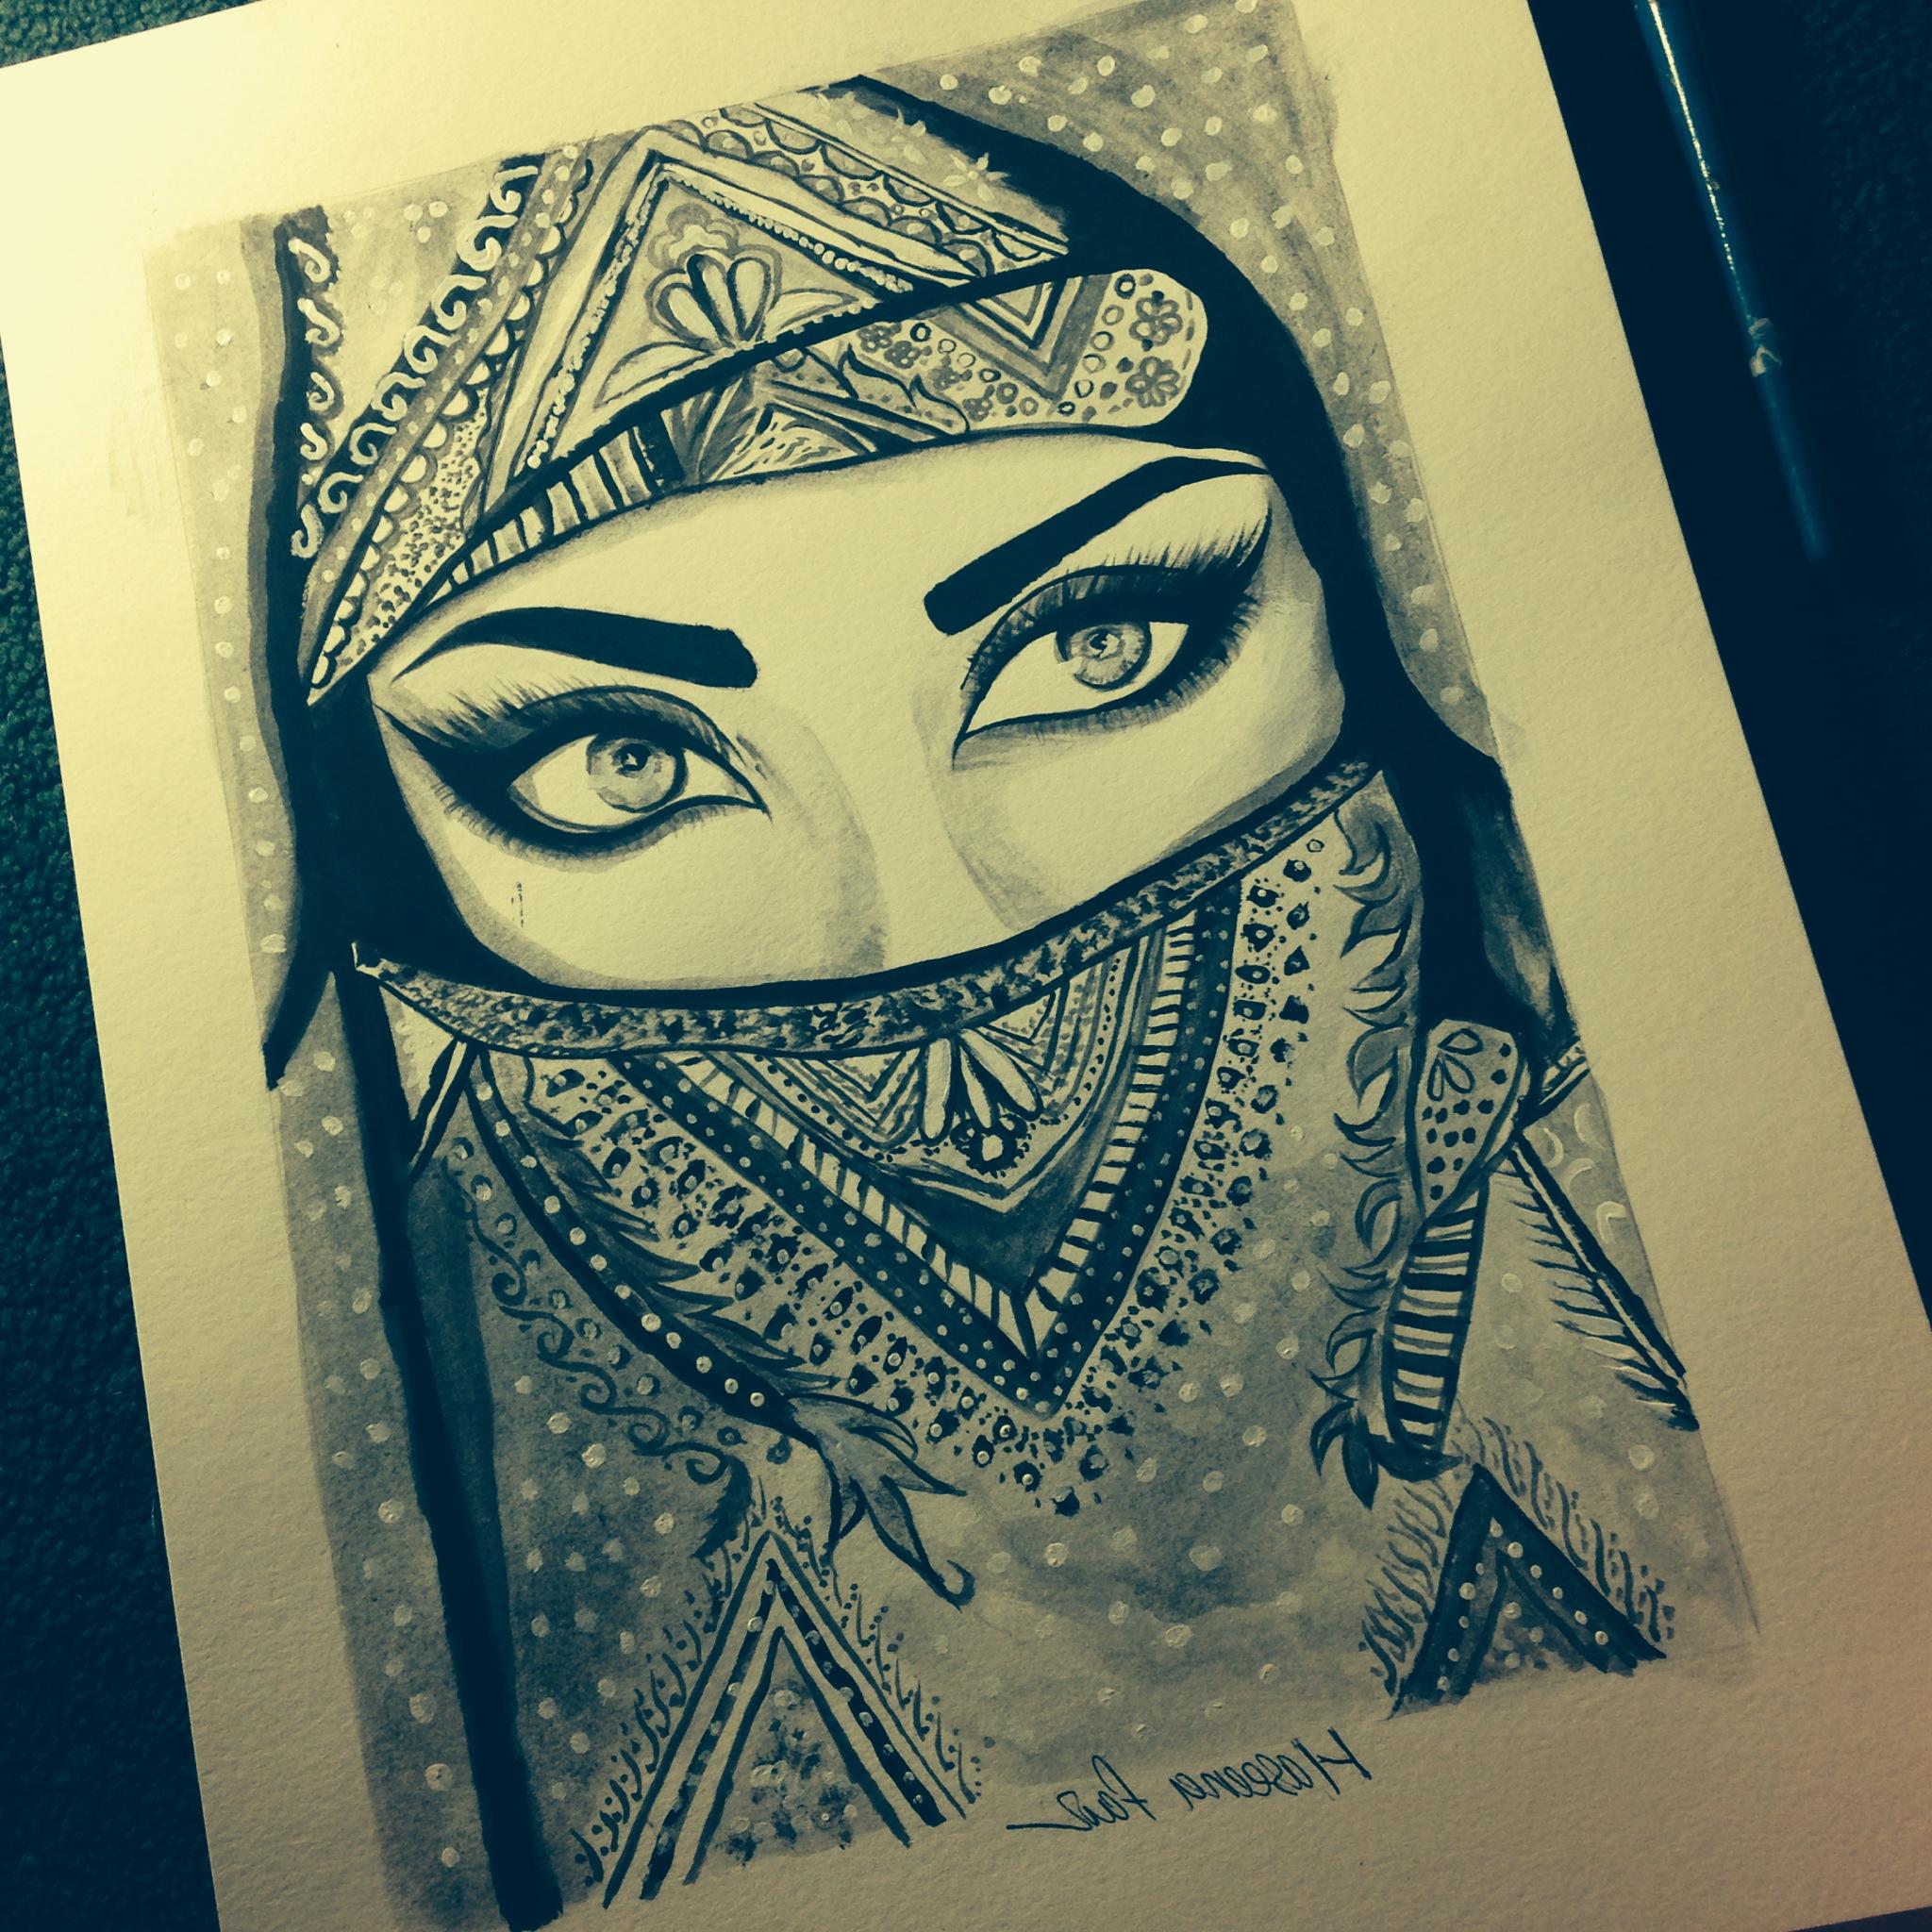 2048x2048 Pencil Sketch Hijab Girl Eyes Realistic Pencil Drawing